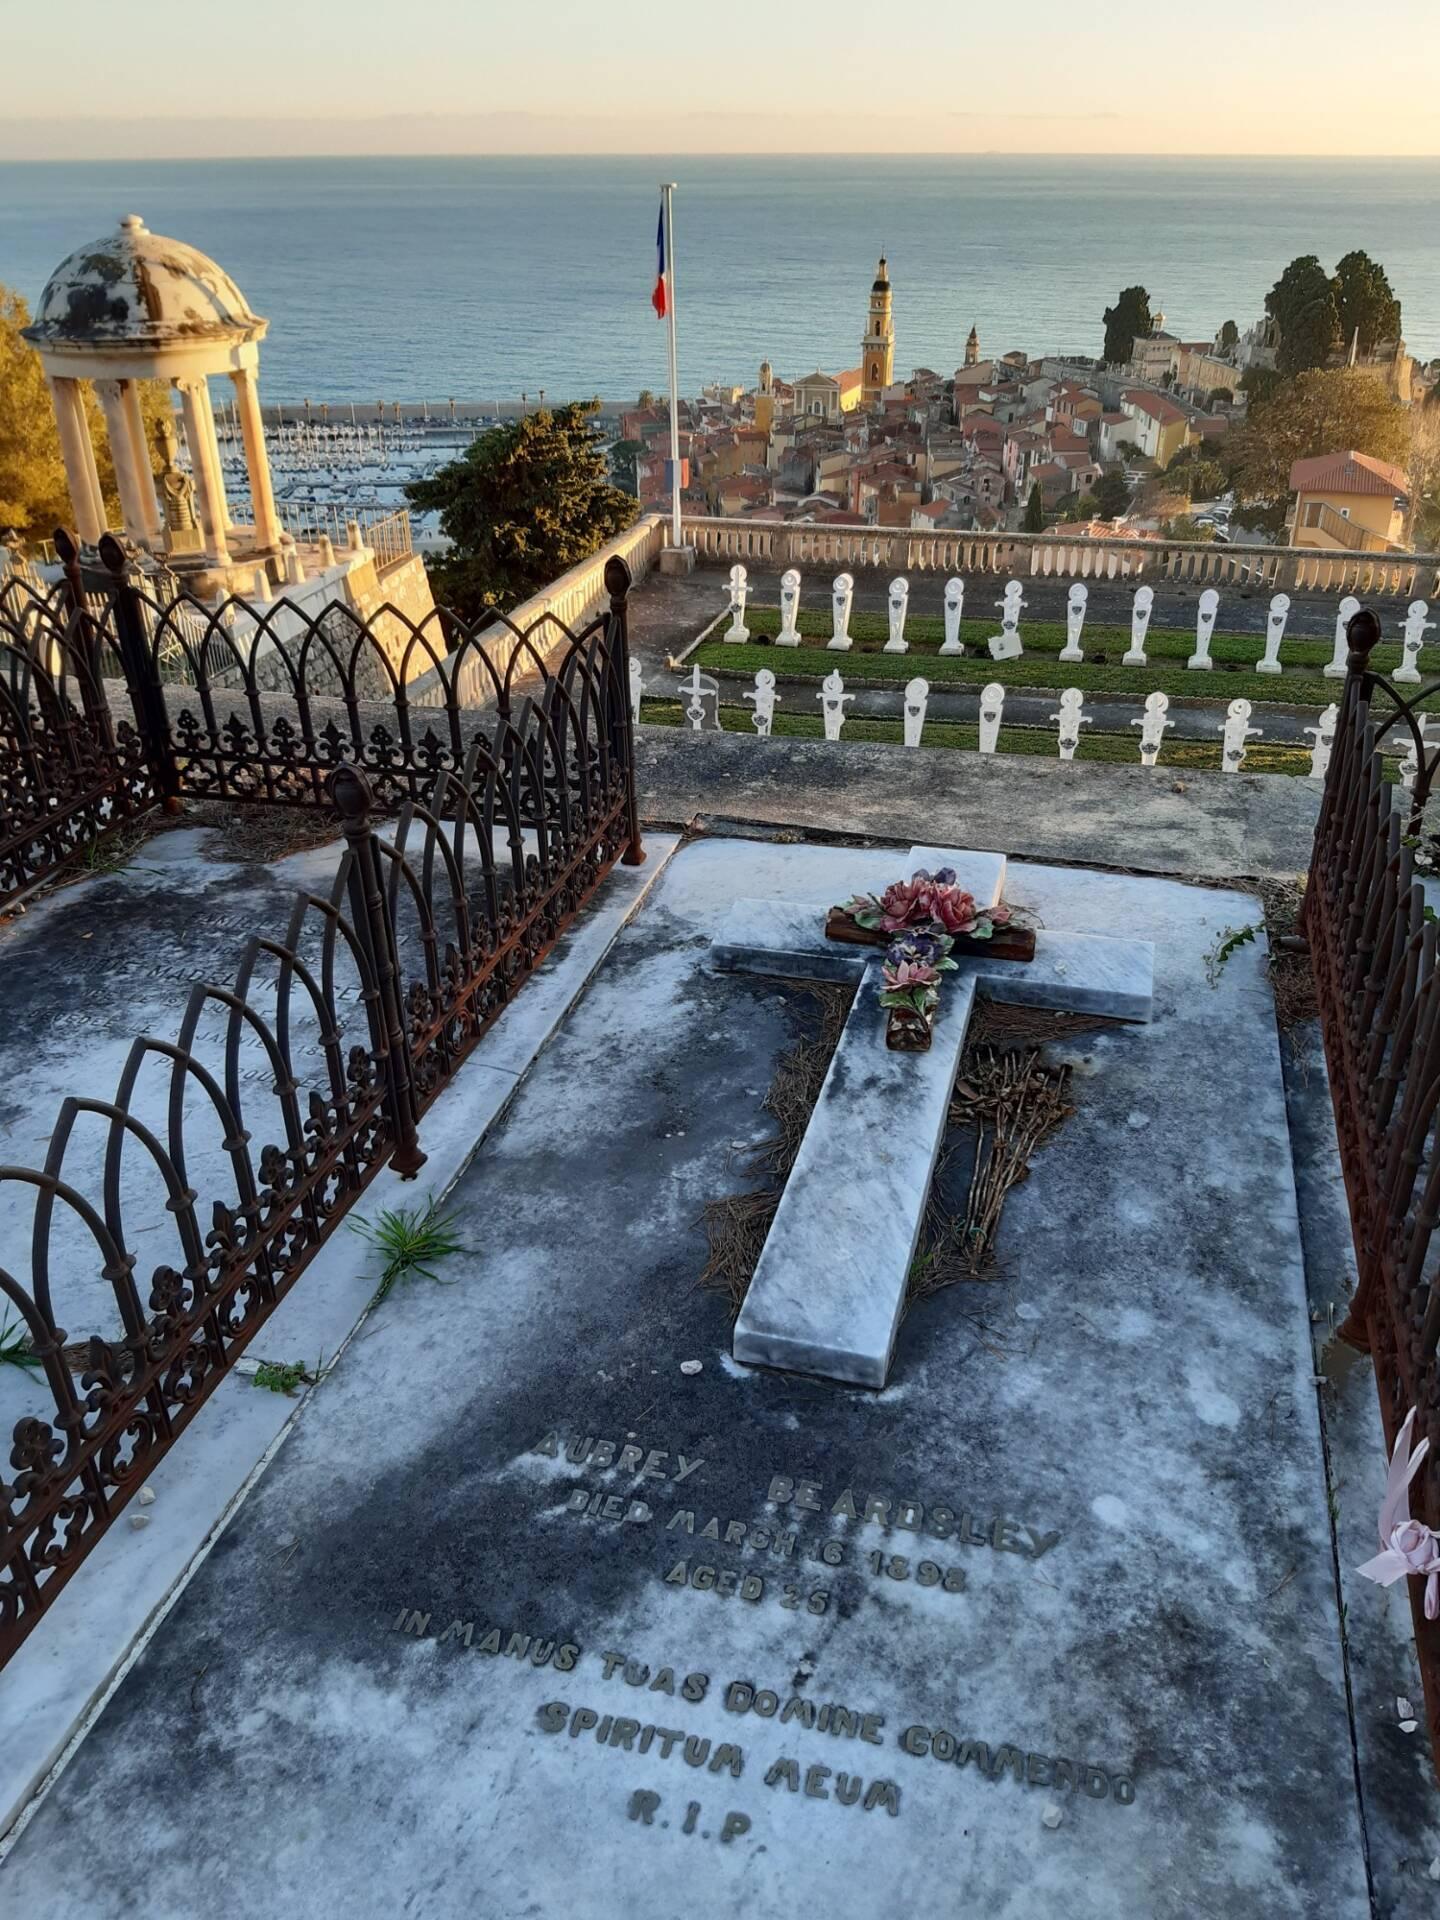 La tombe d'Aubrey Beardsley au Trabuquet.